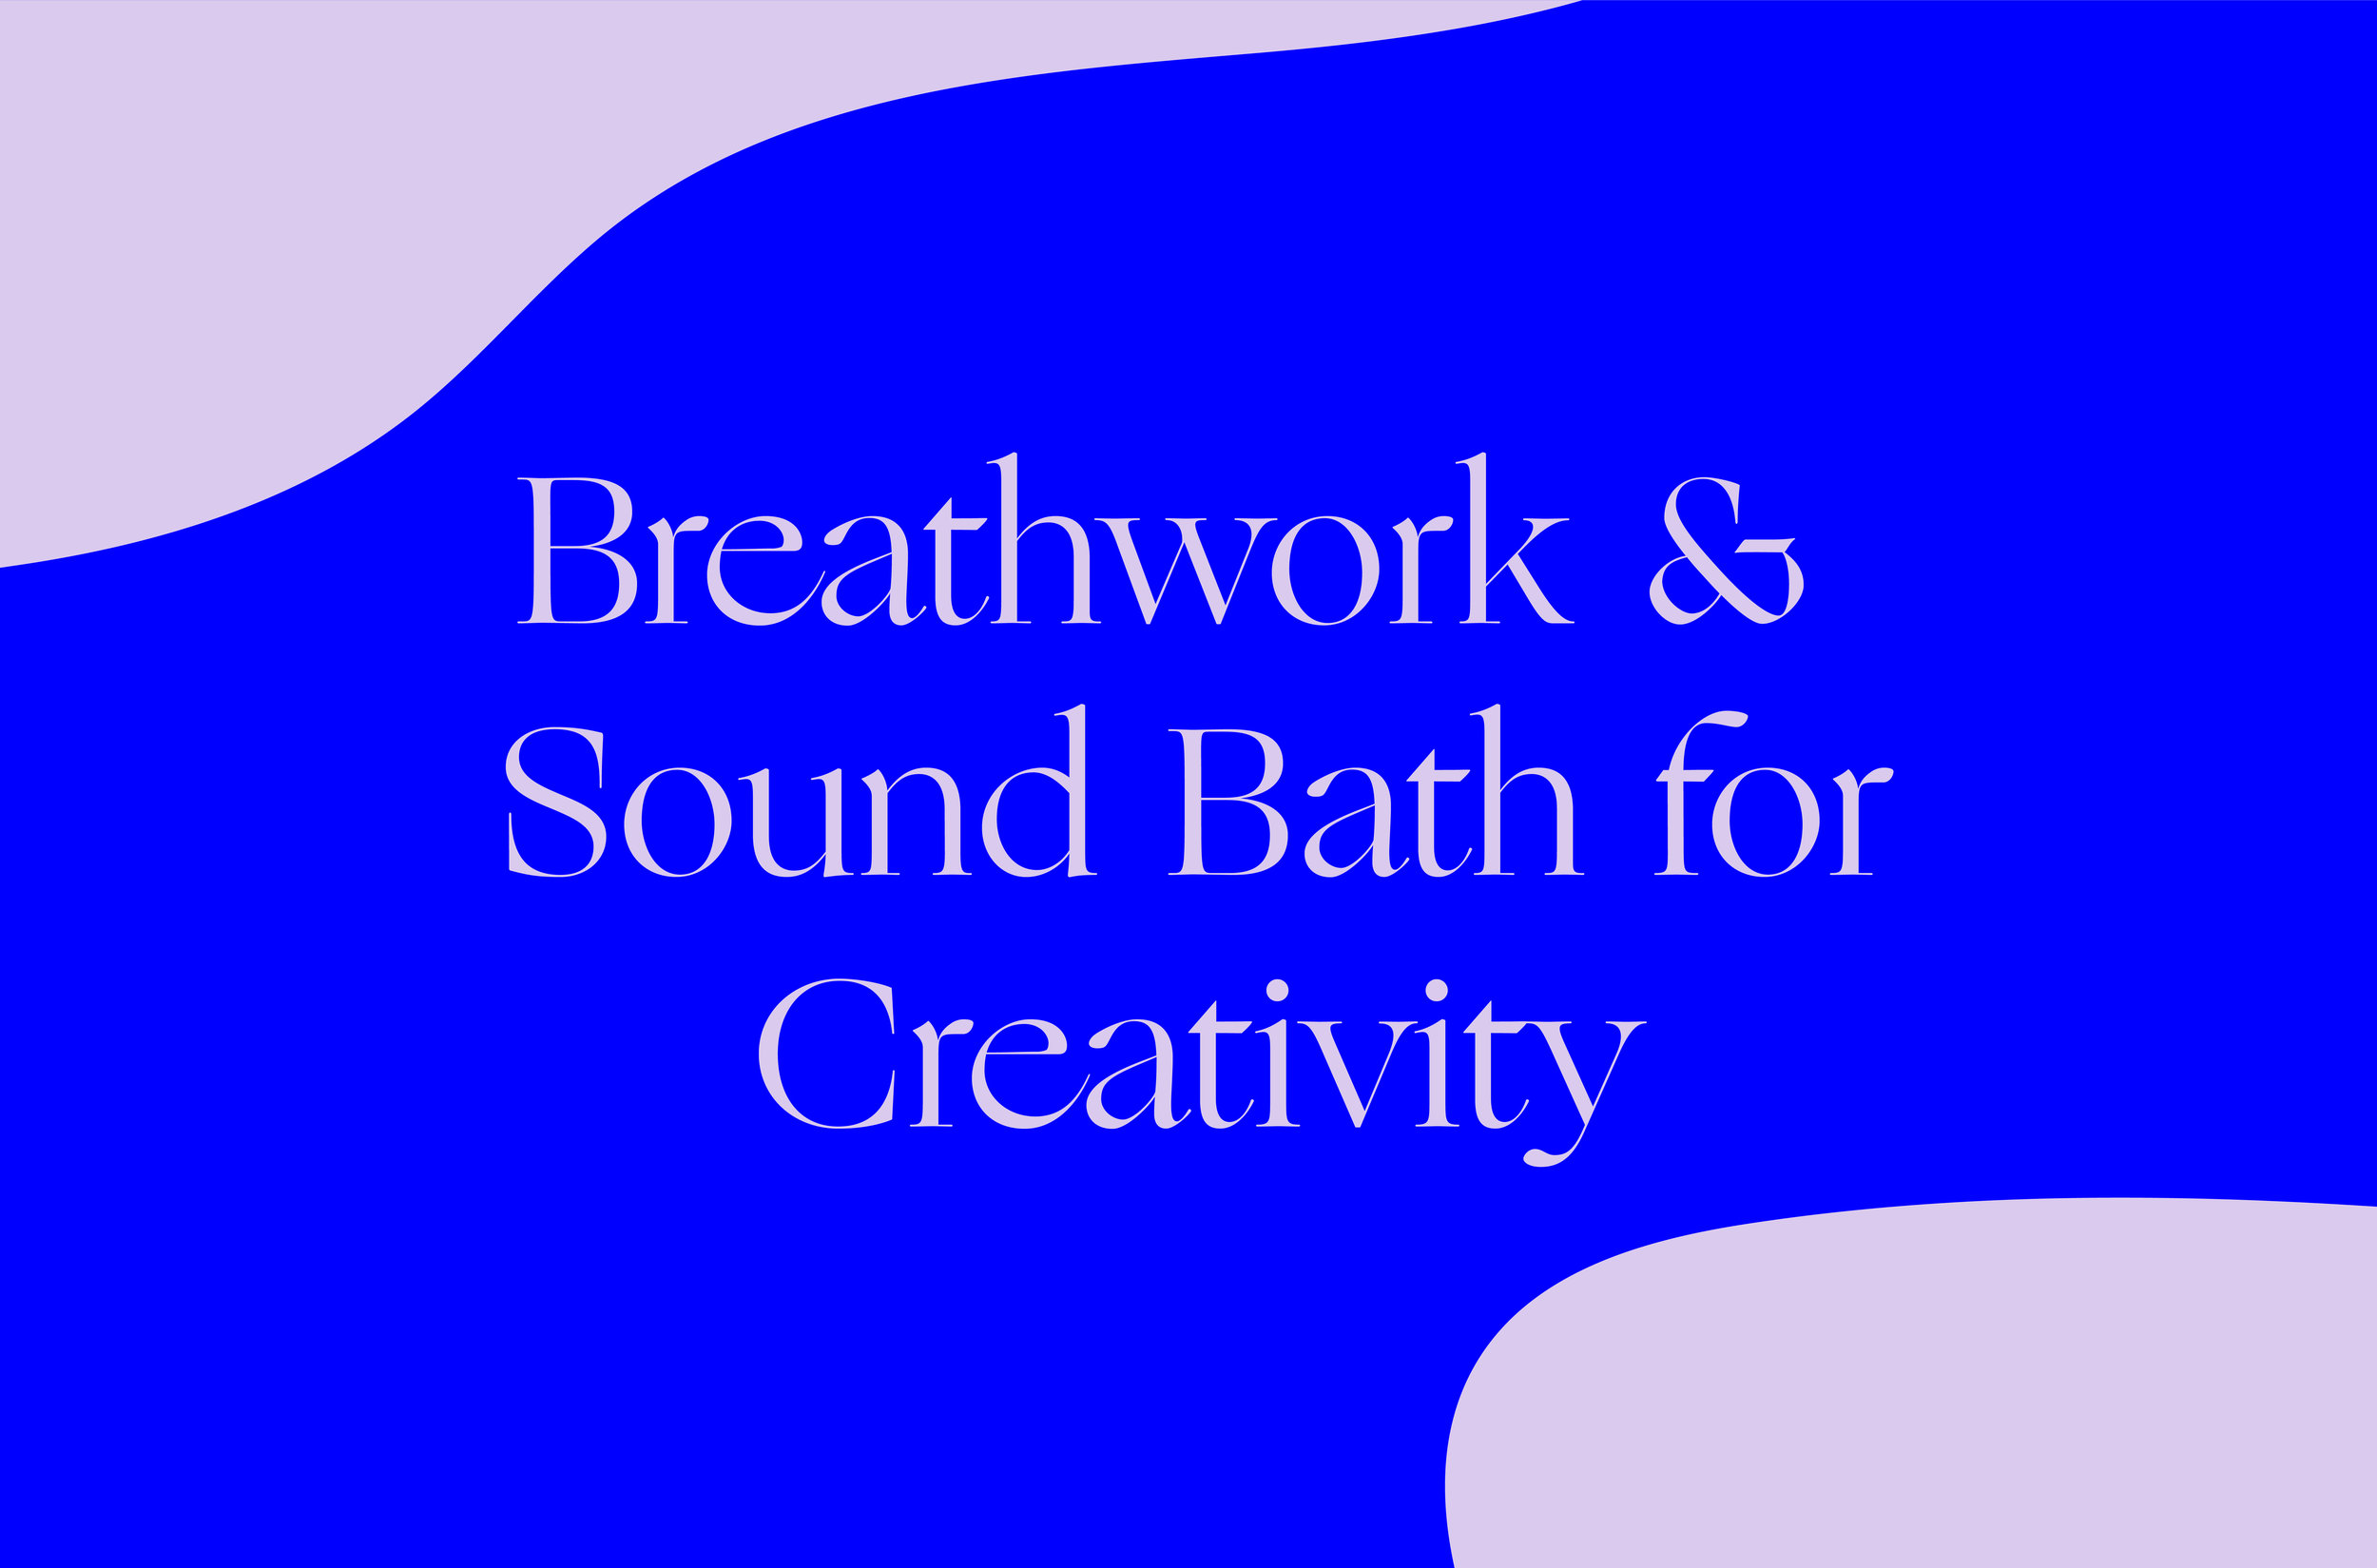 BWSB-Creativity-01.jpg